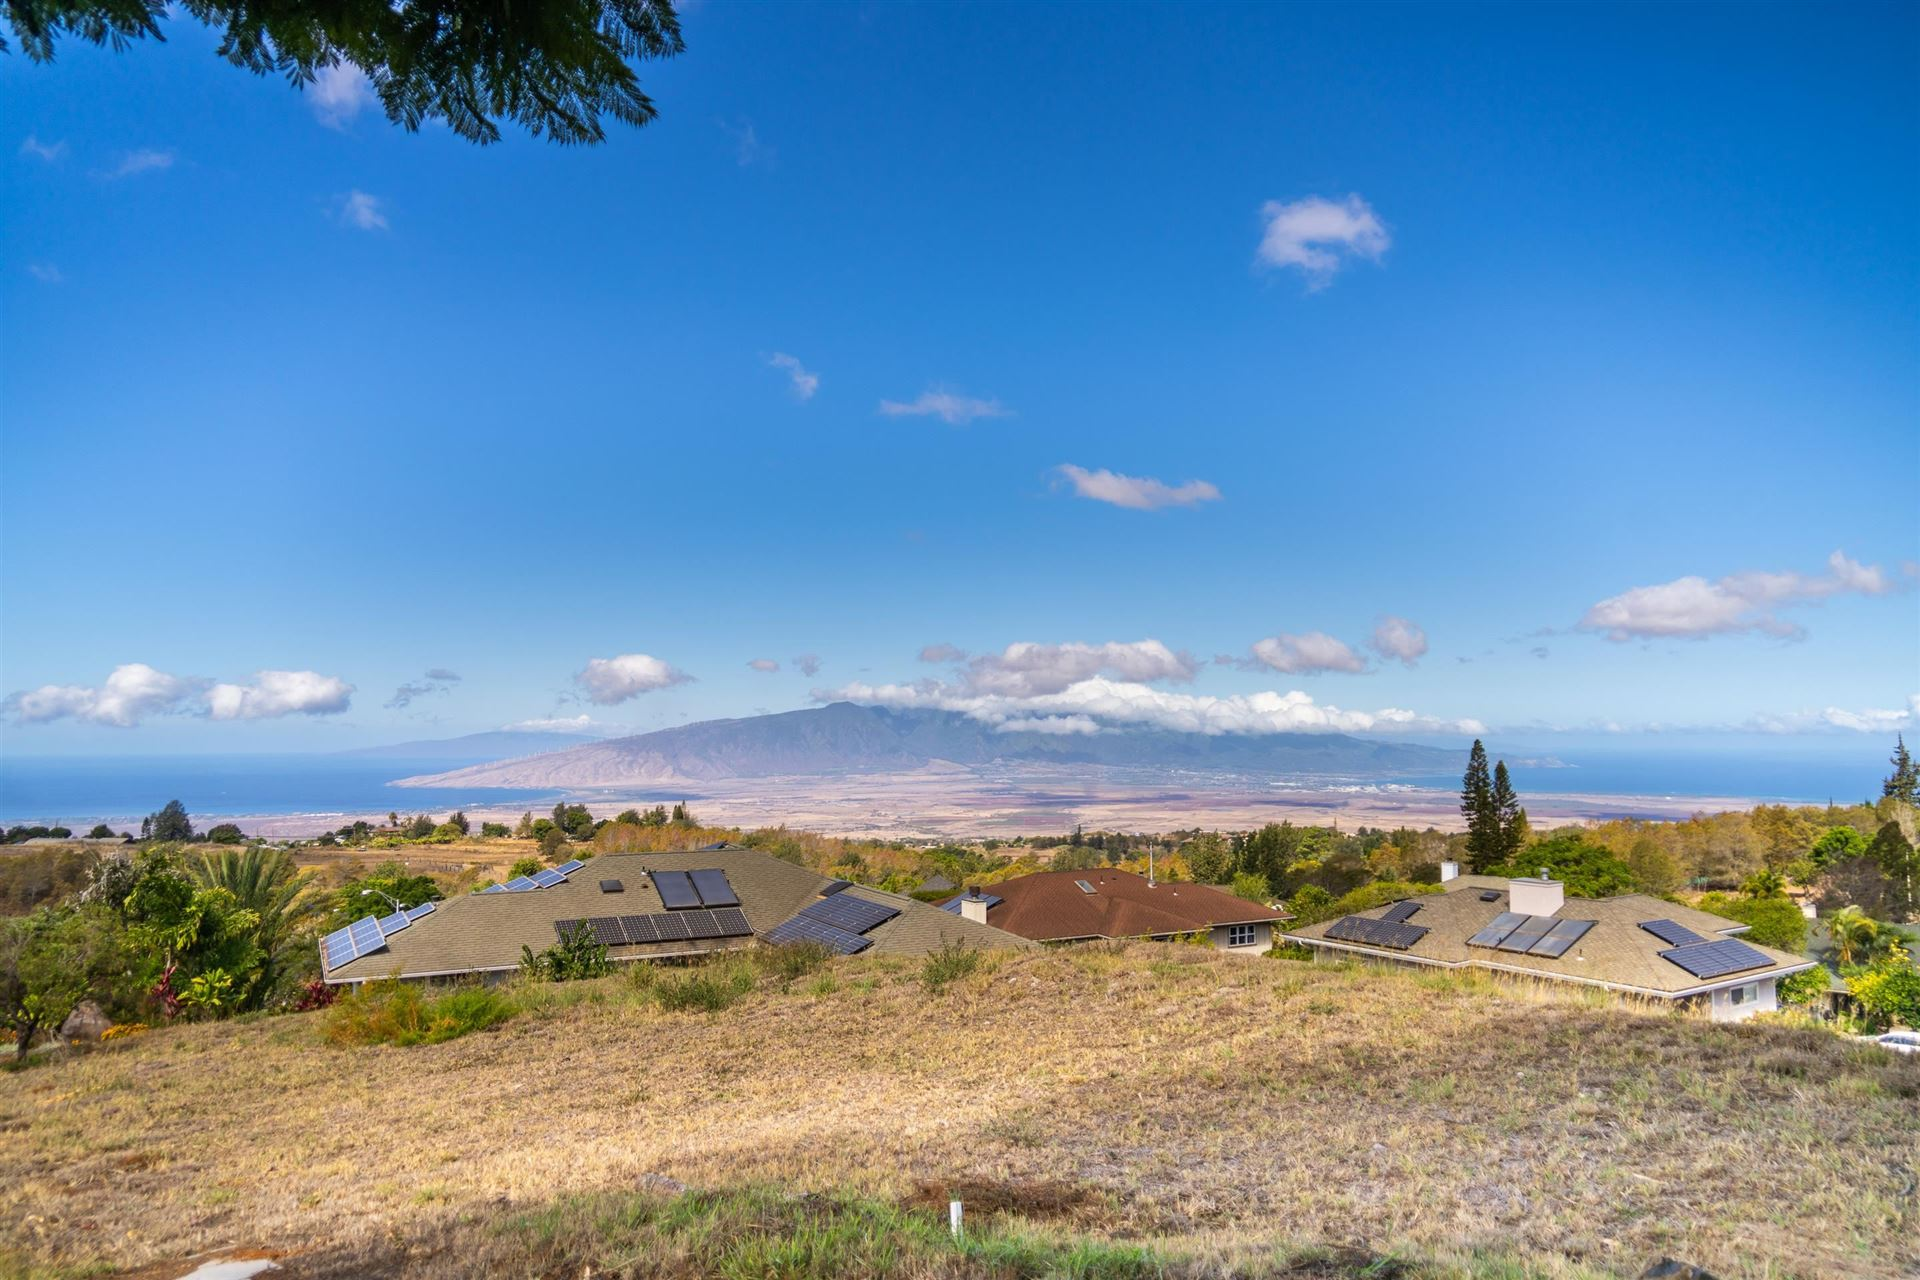 Photo of 47 Kulamanu Cir, Kula, HI 96790 (MLS # 393191)